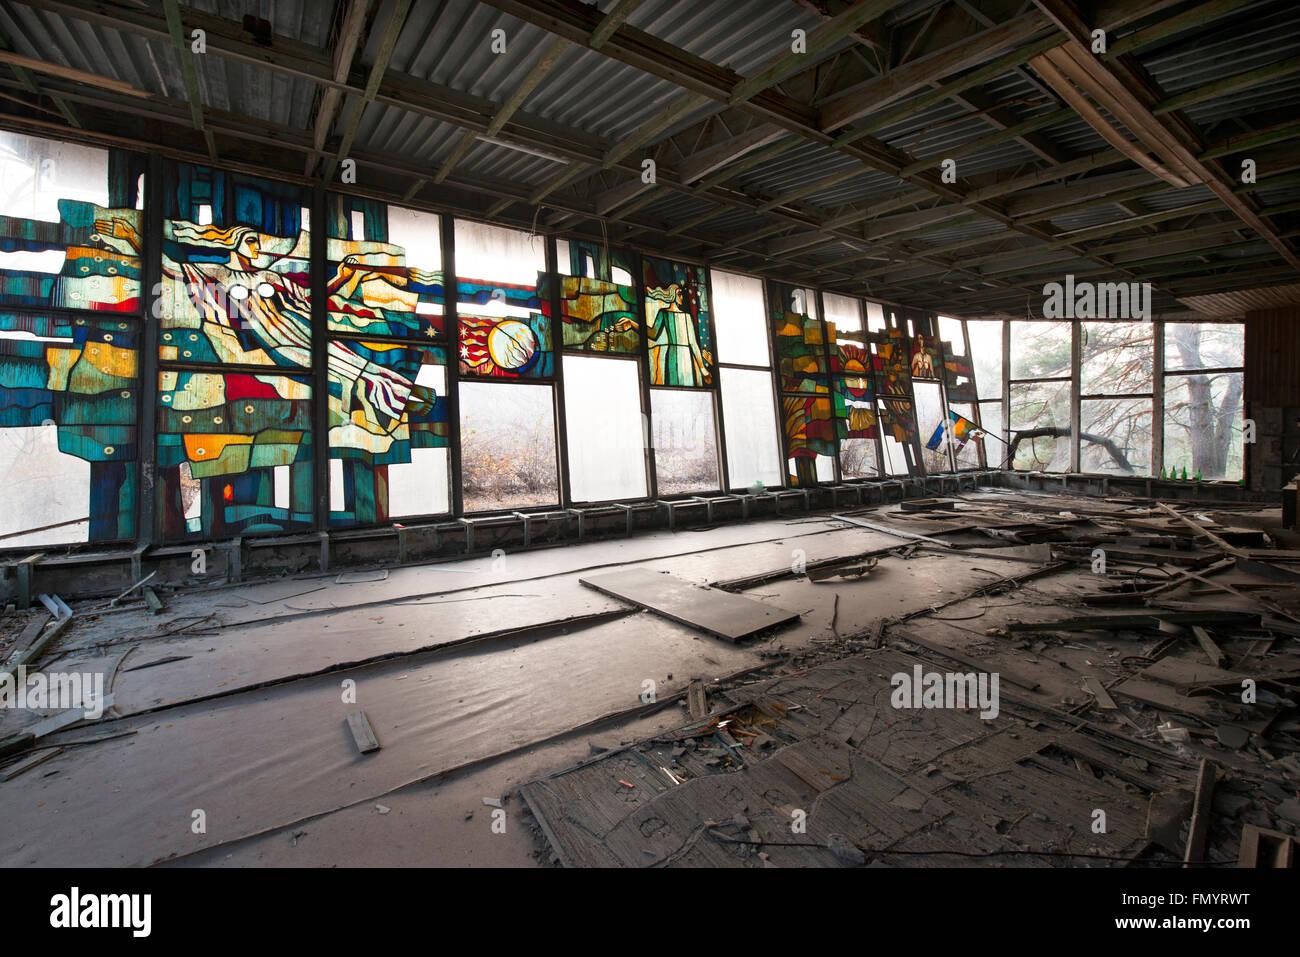 Dining area in Pripyat, Chernobyl scene of 1986 nuclear disaster - Stock Image